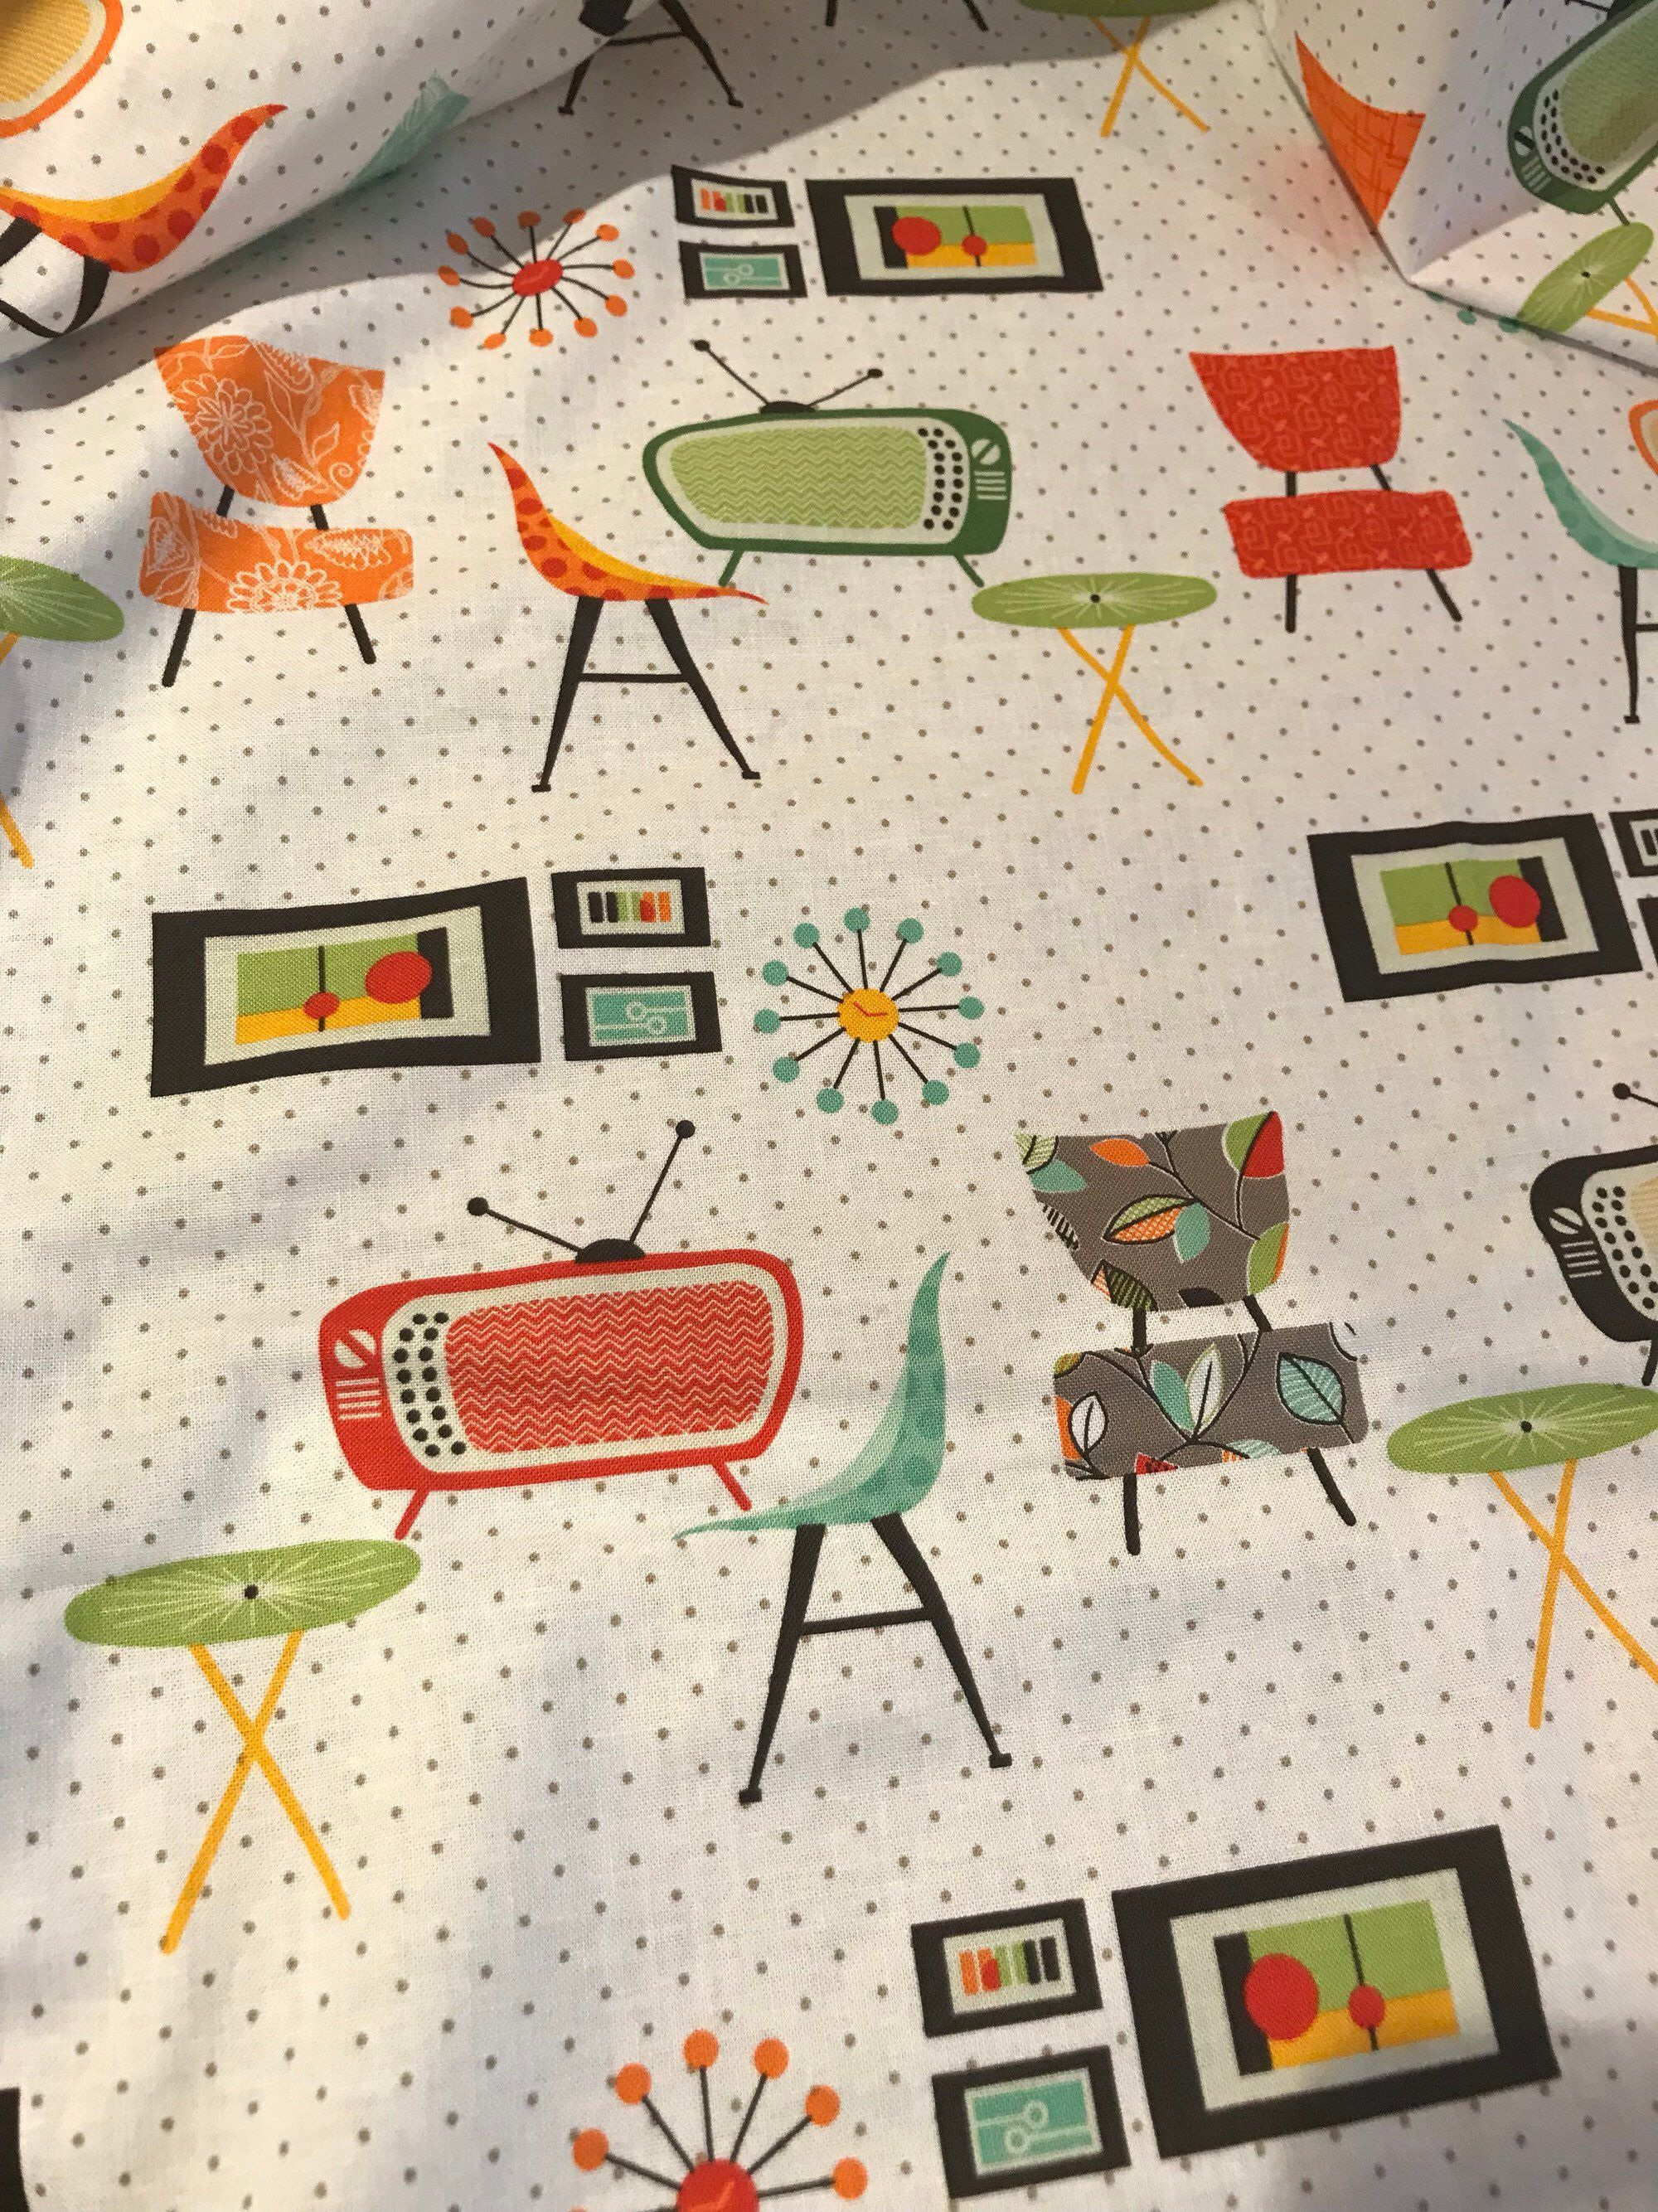 Mid Century Modern Atomic Retro 50s Style Curtains For Kitchen Etsy Retro Home Retro Home Decor Mid Century Decor